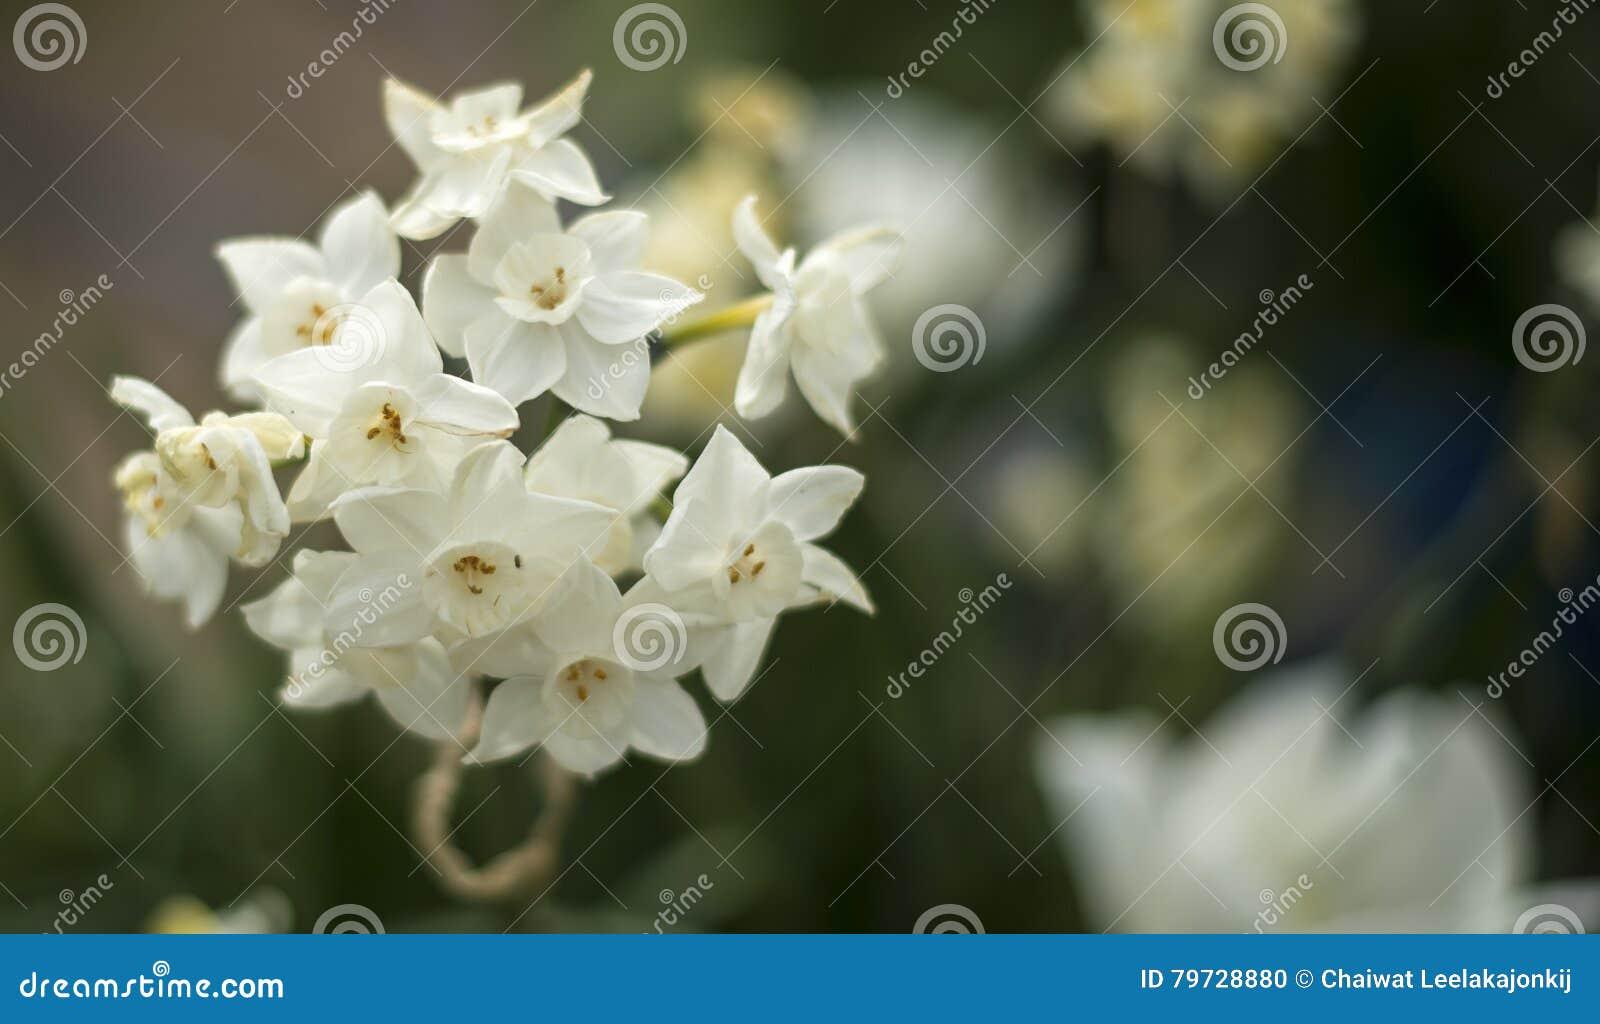 Flor de la flor blanca